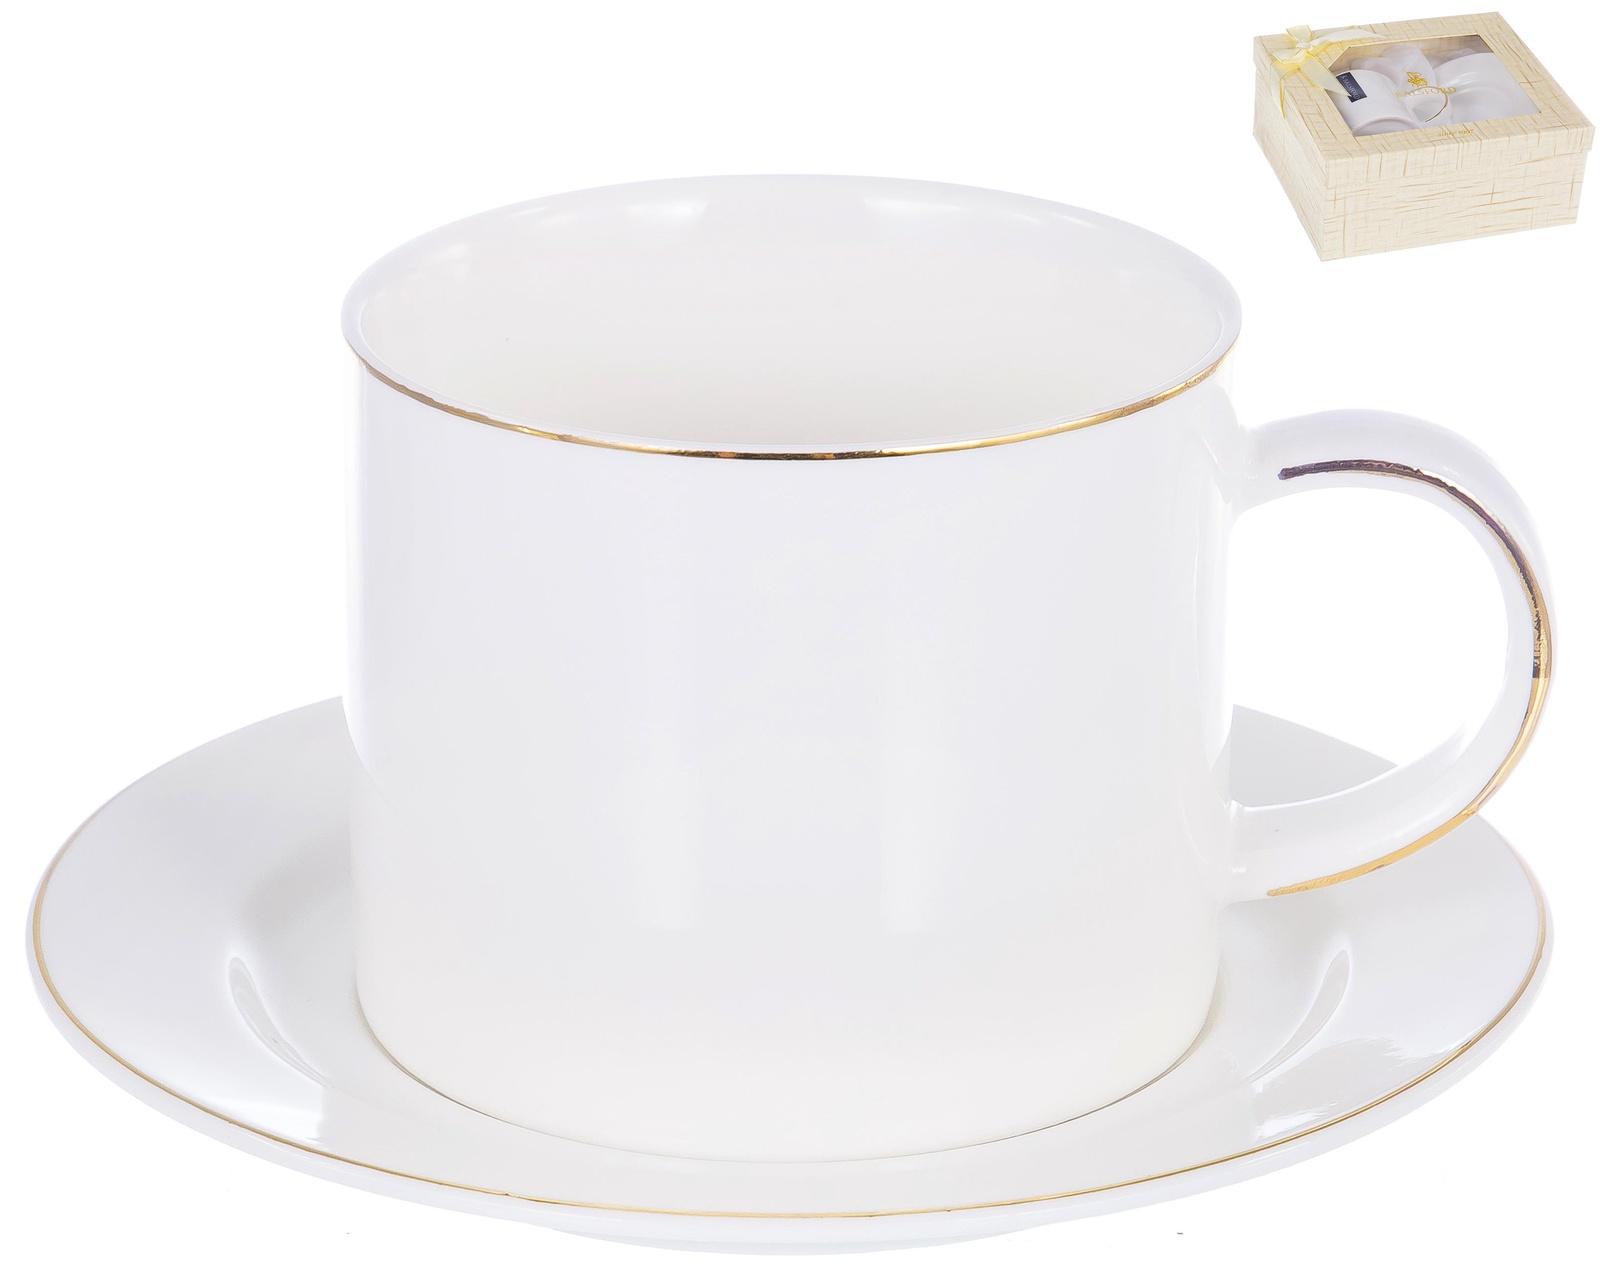 Чайная пара ГРАЦИЯ серия ДАКИНИ: чашка 280мл, блюдце,ТМ Balsford, артикул 101-01040